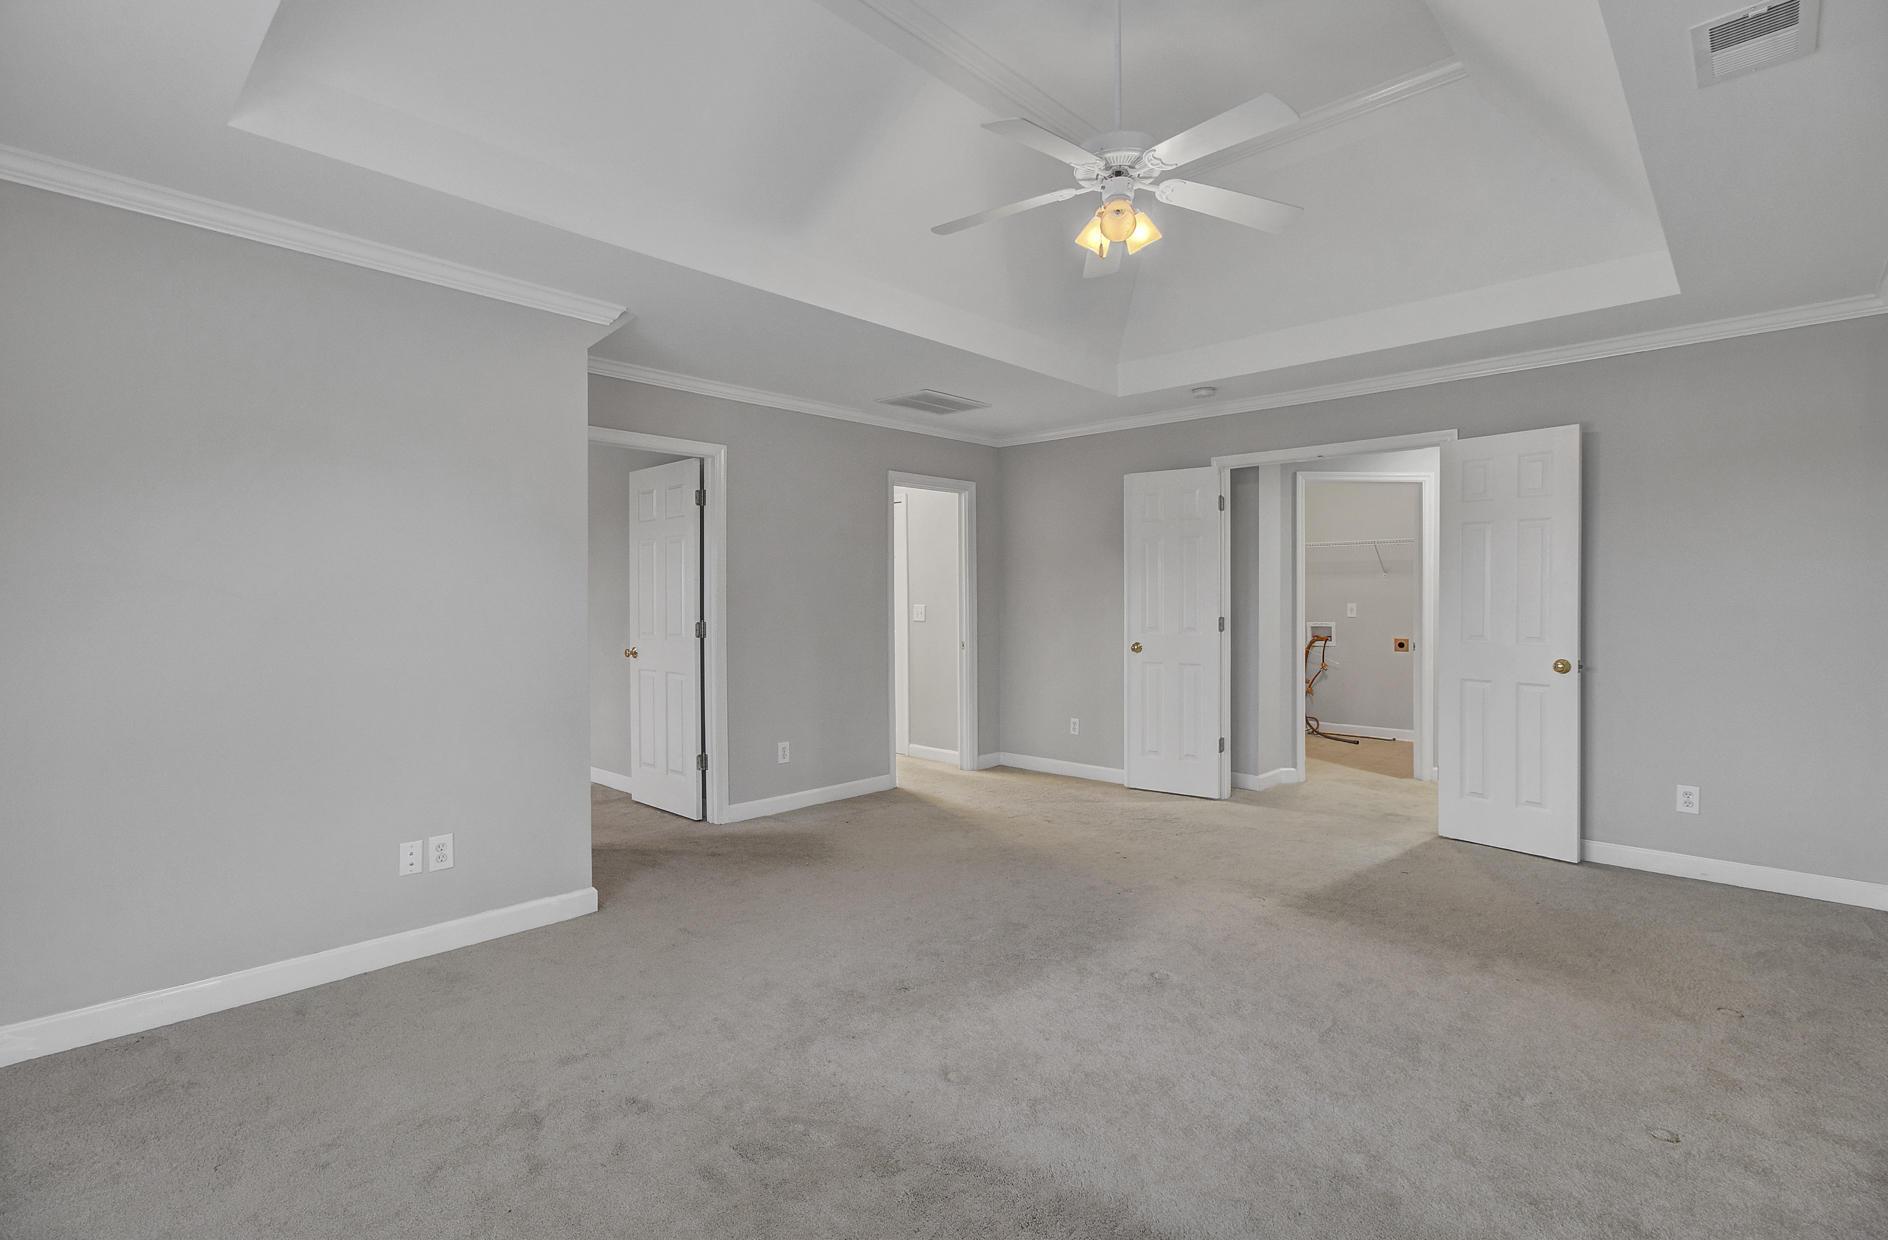 Dunes West Homes For Sale - 2321 Darts Cove, Mount Pleasant, SC - 24